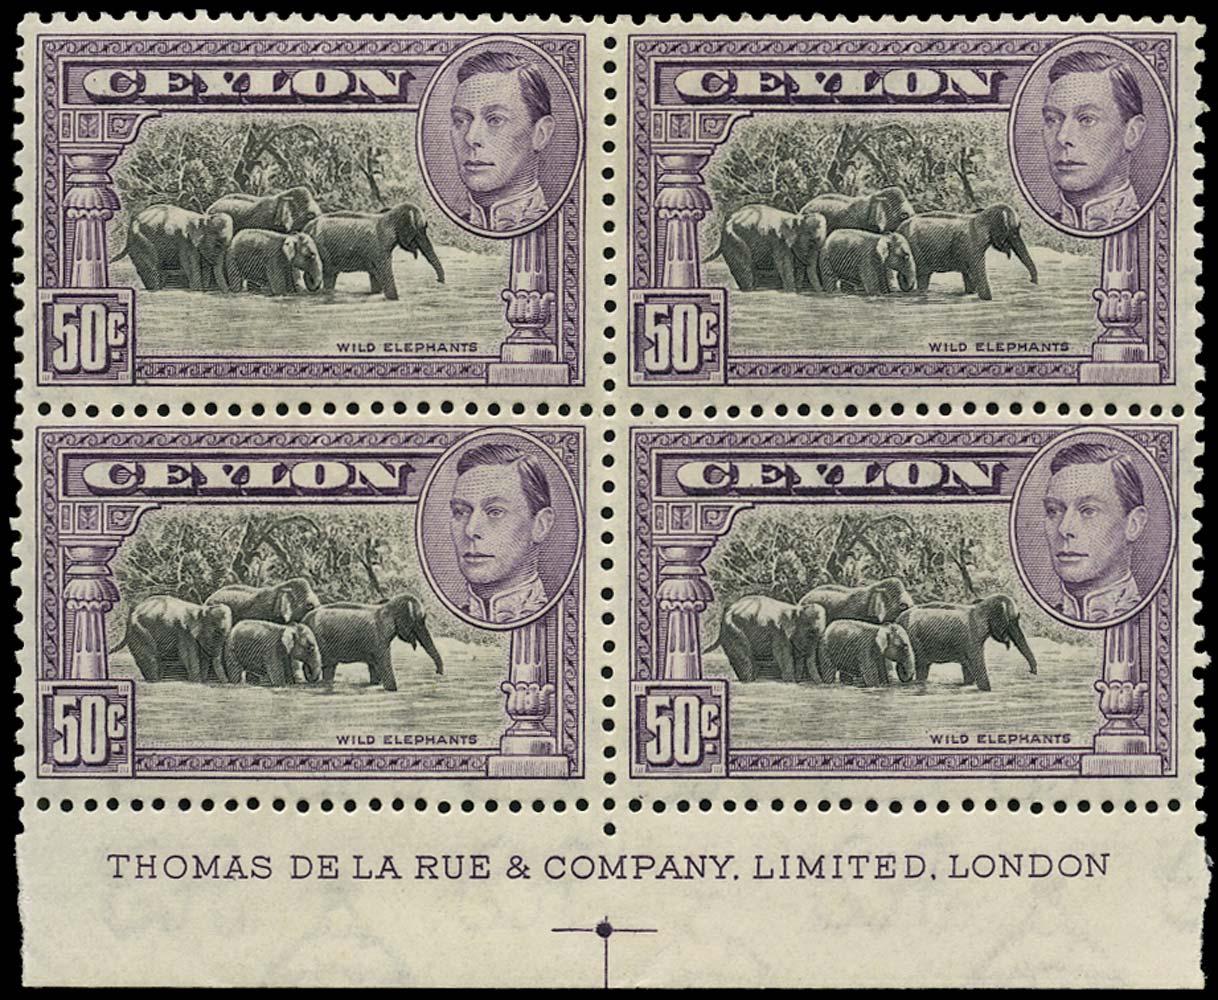 CEYLON 1938  SG394 Mint 50c black and mauve perf 13x11½ imprint block